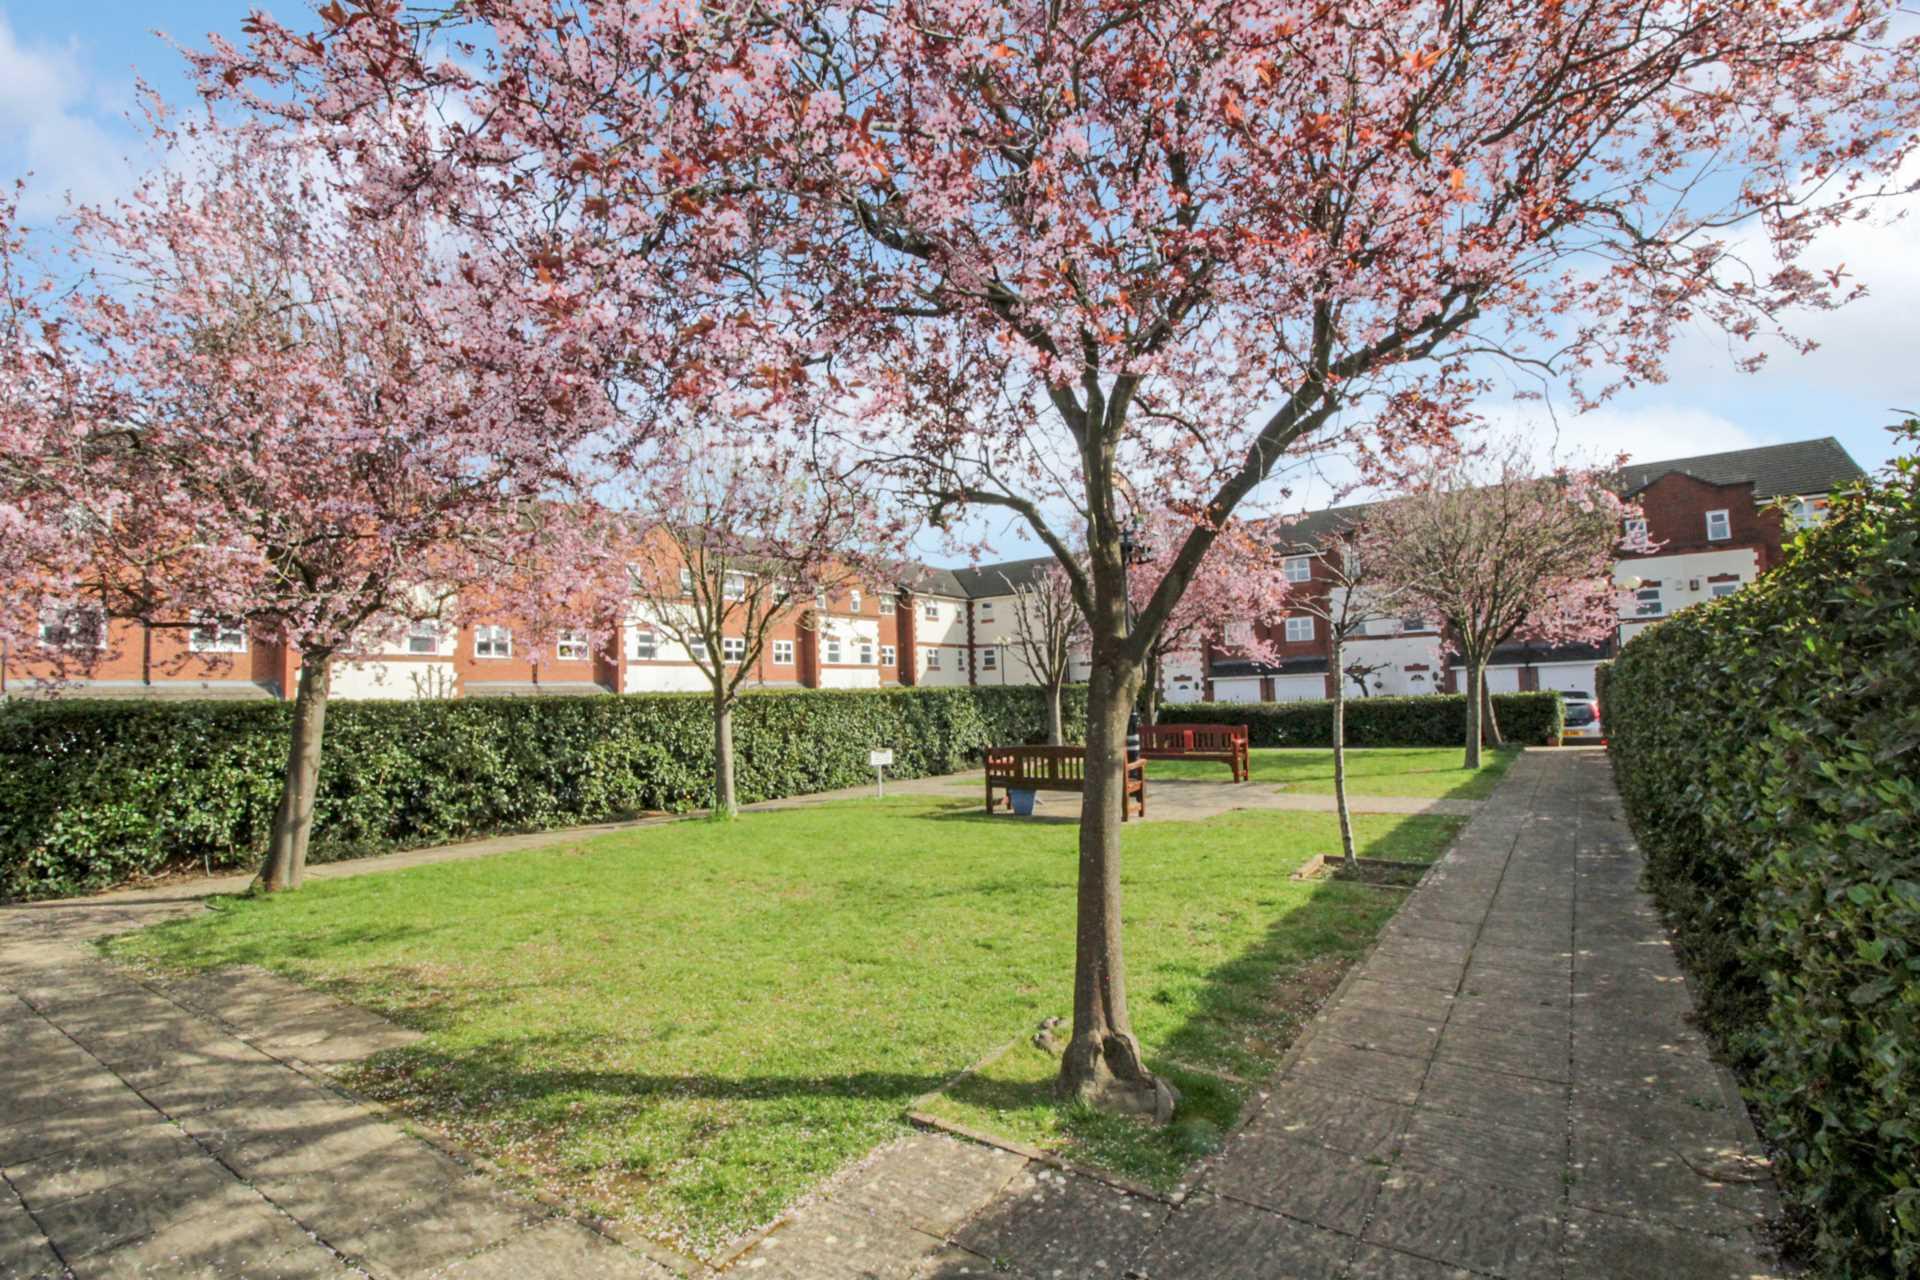 Coopers Gate, Banbury, Image 3